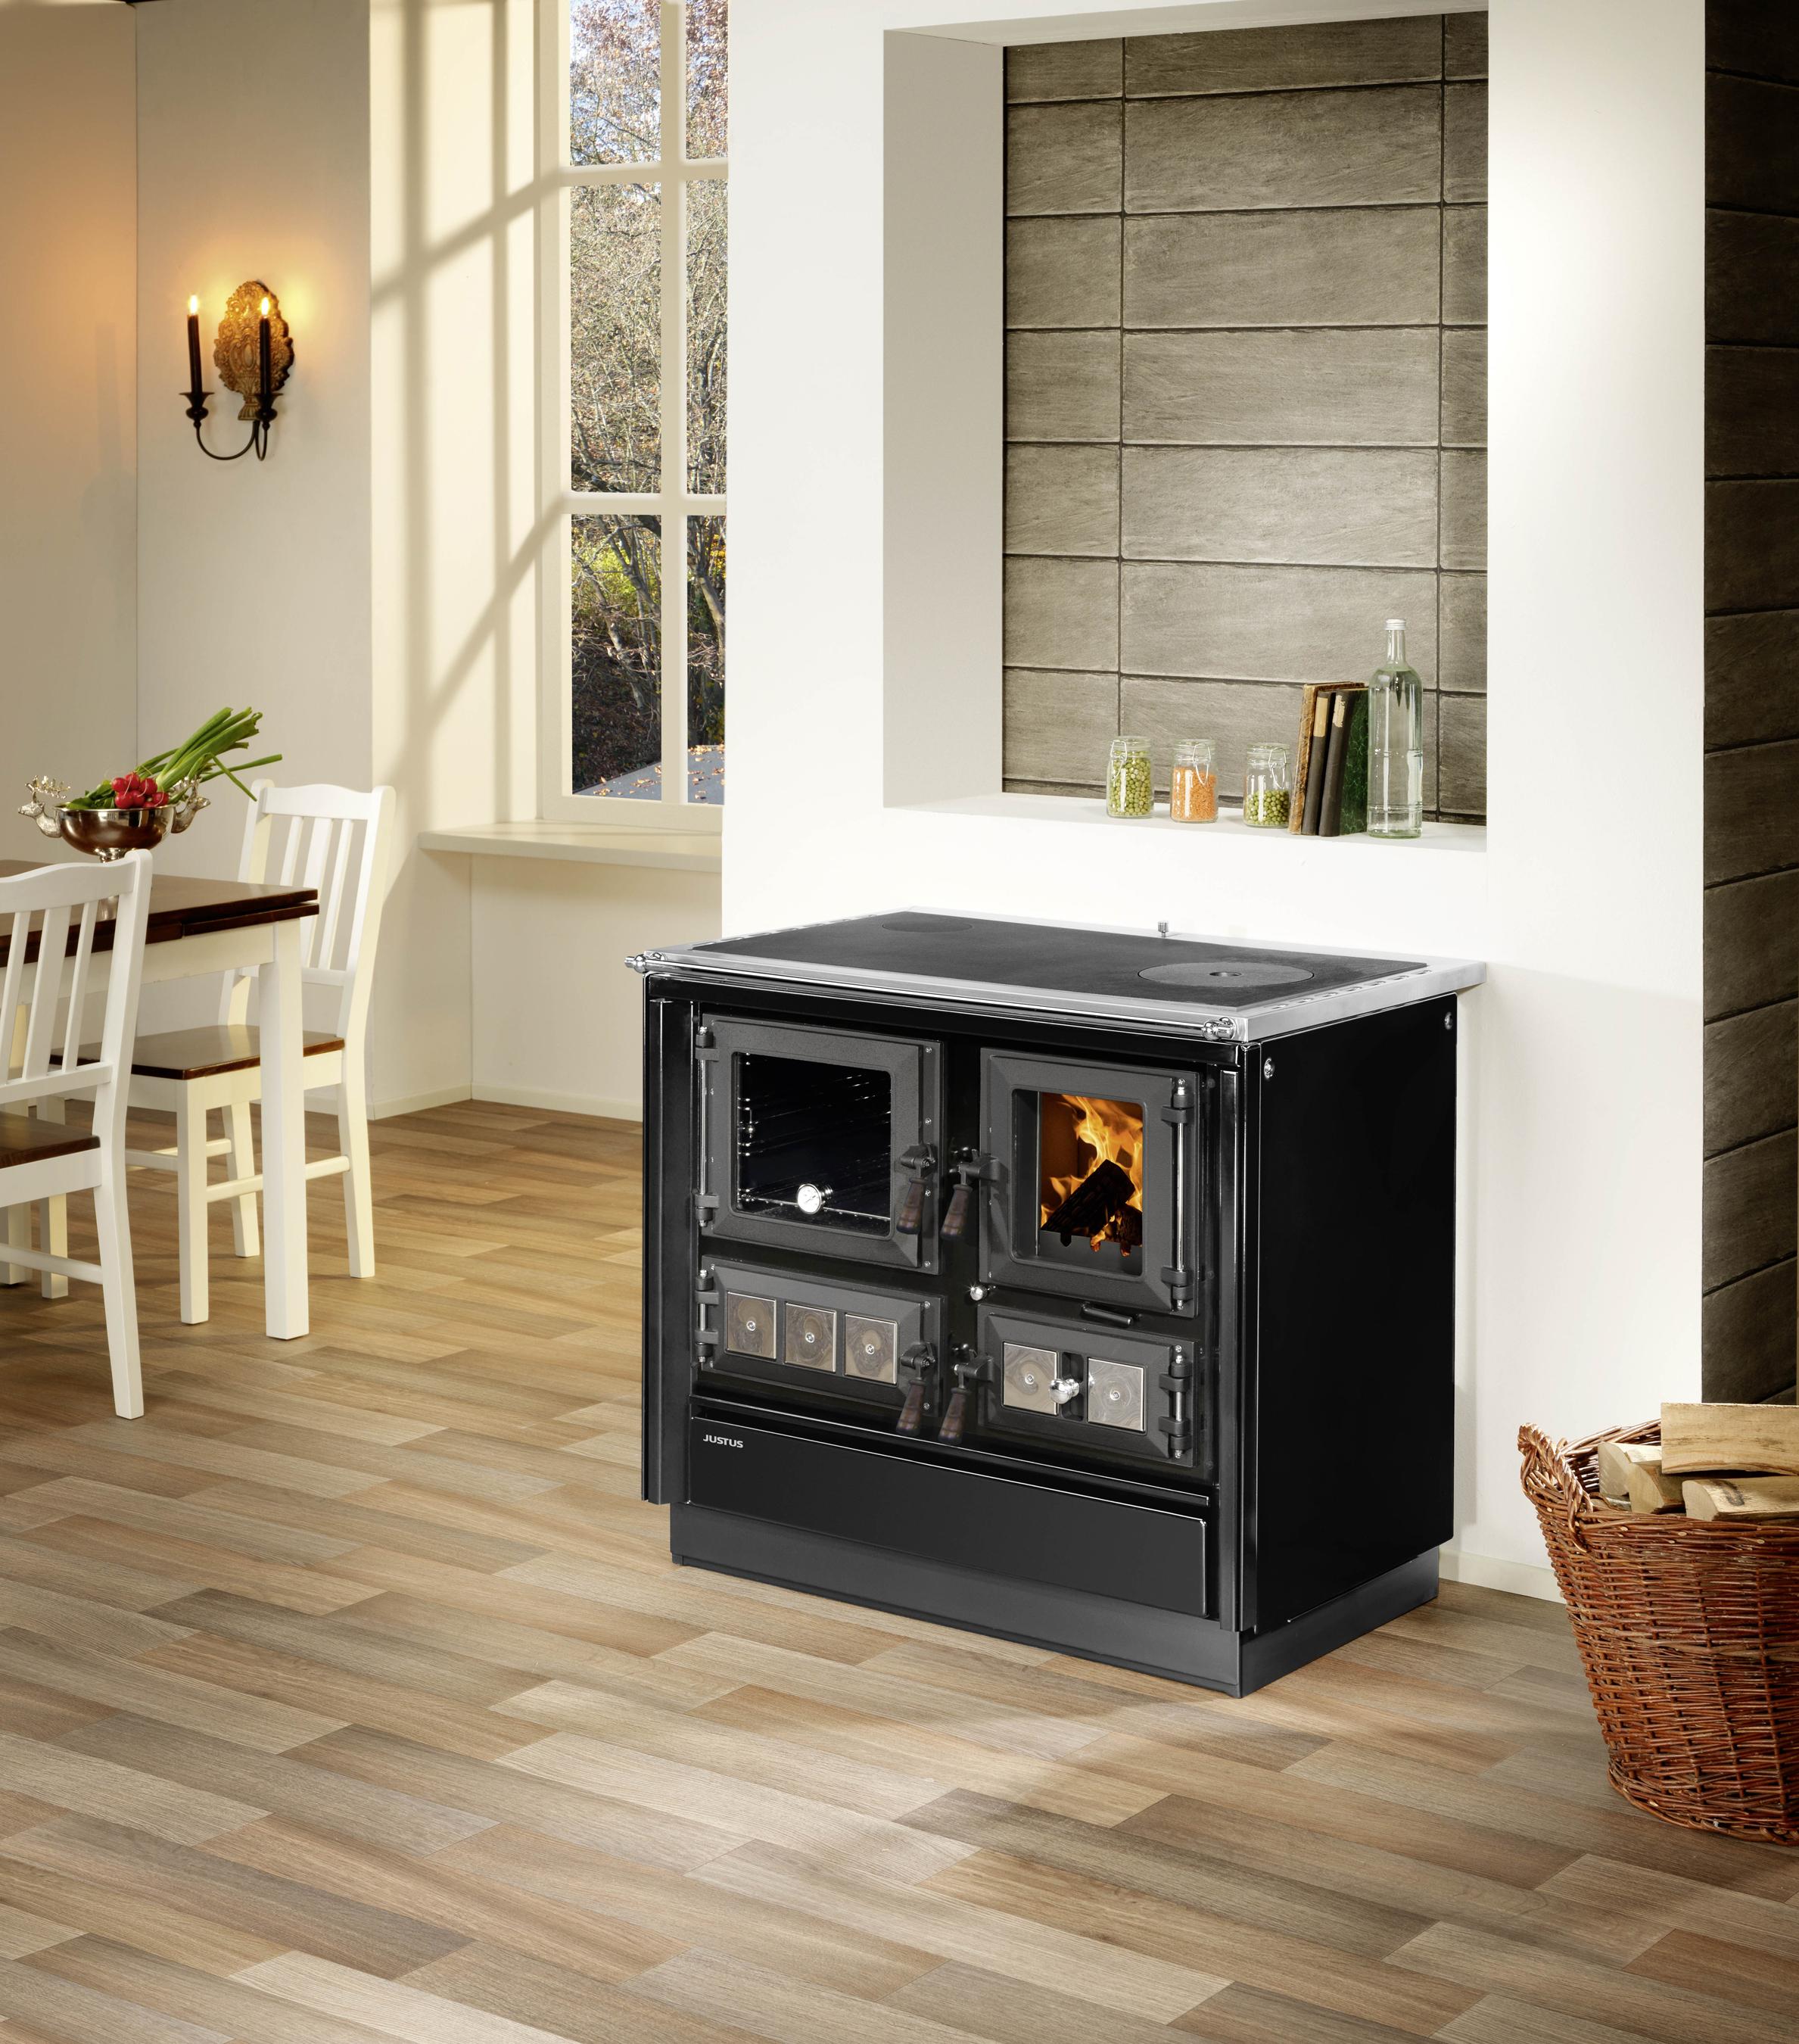 Küchenherd Justus Festbrennstoffherd Rustico-90 2.0 li Stahl  schwarz Bild 2